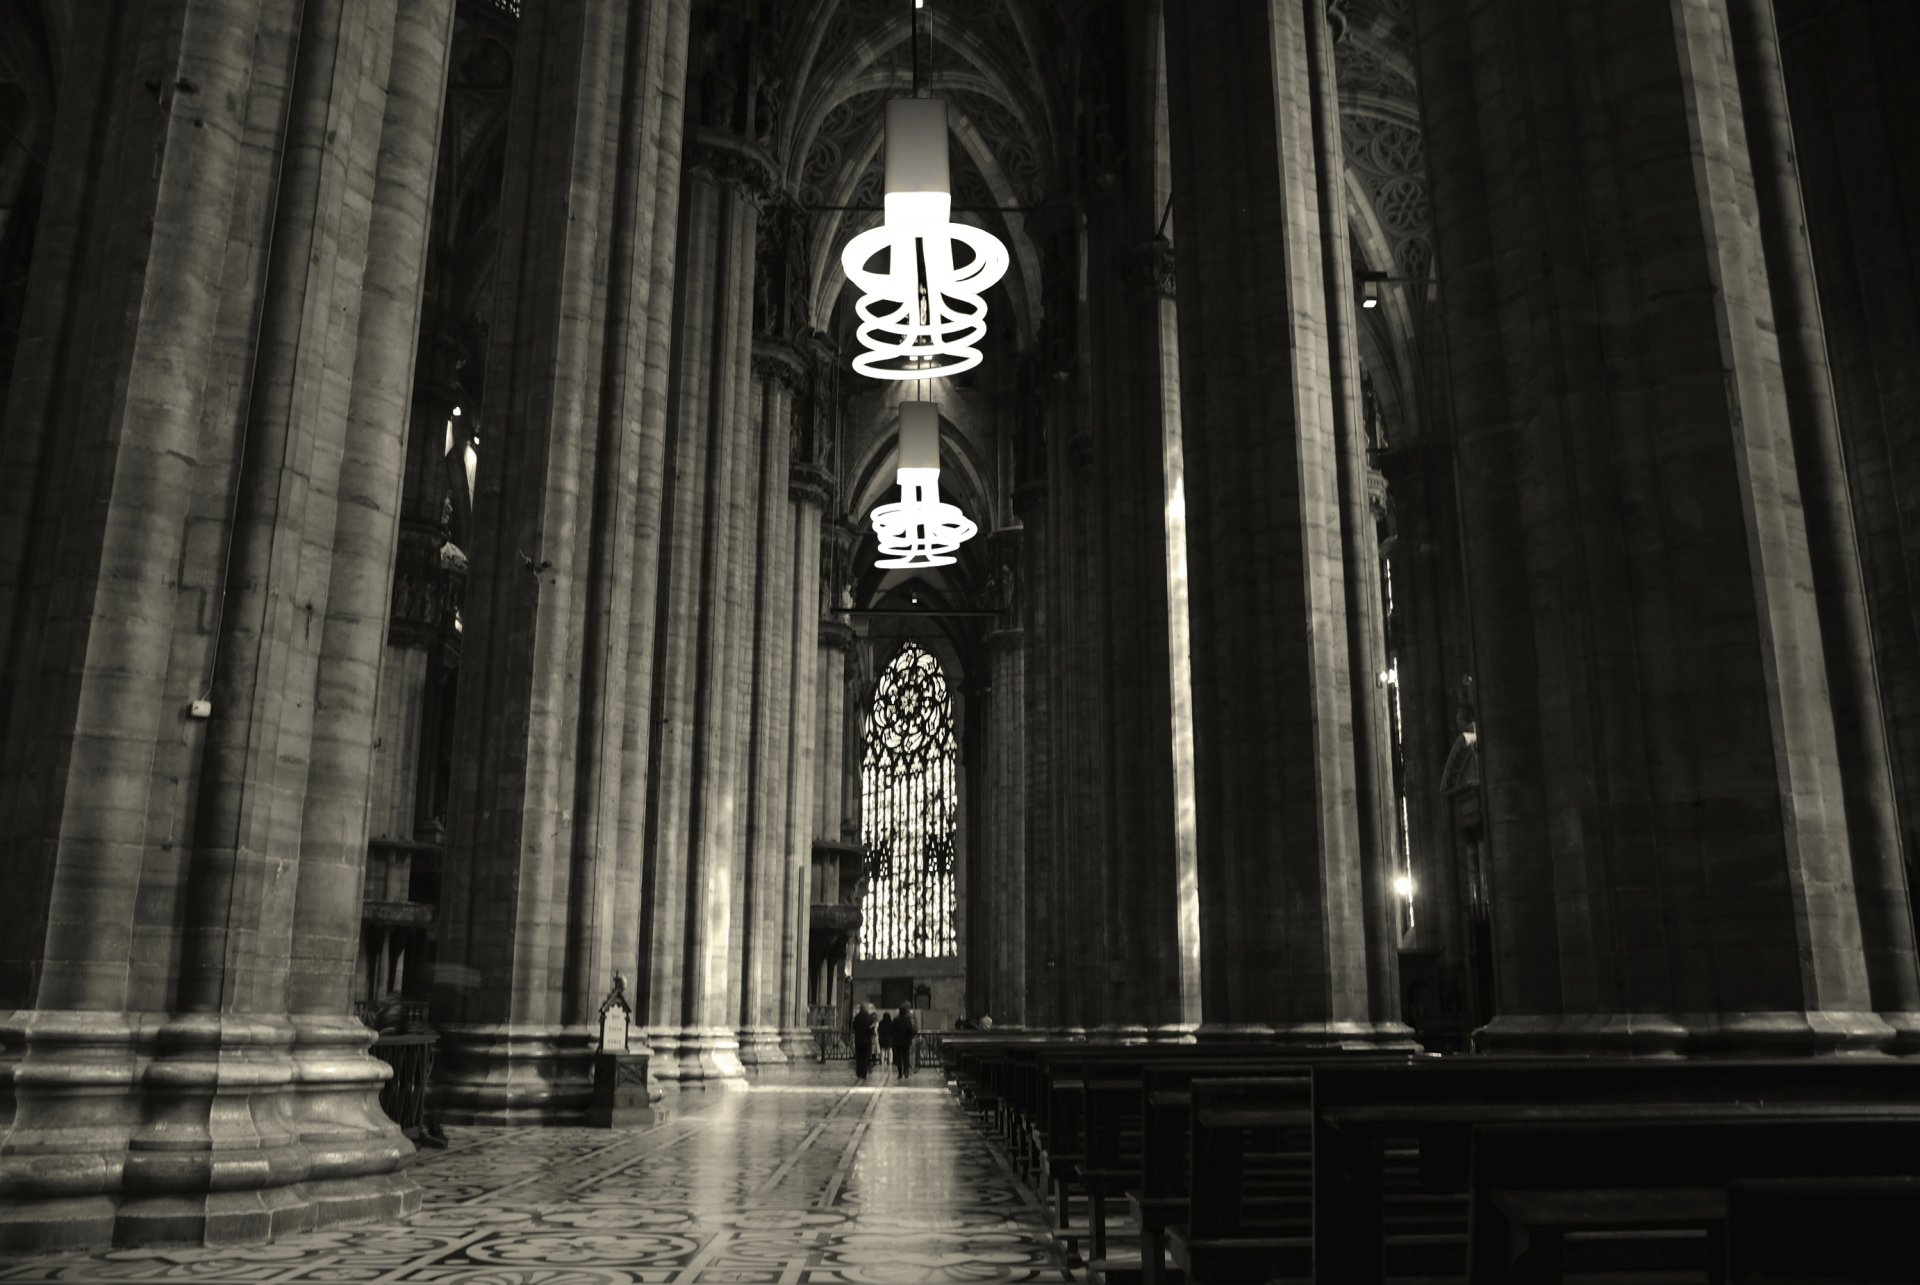 plumen-prototype-2-church Prototypes (3 different neons) Hulger